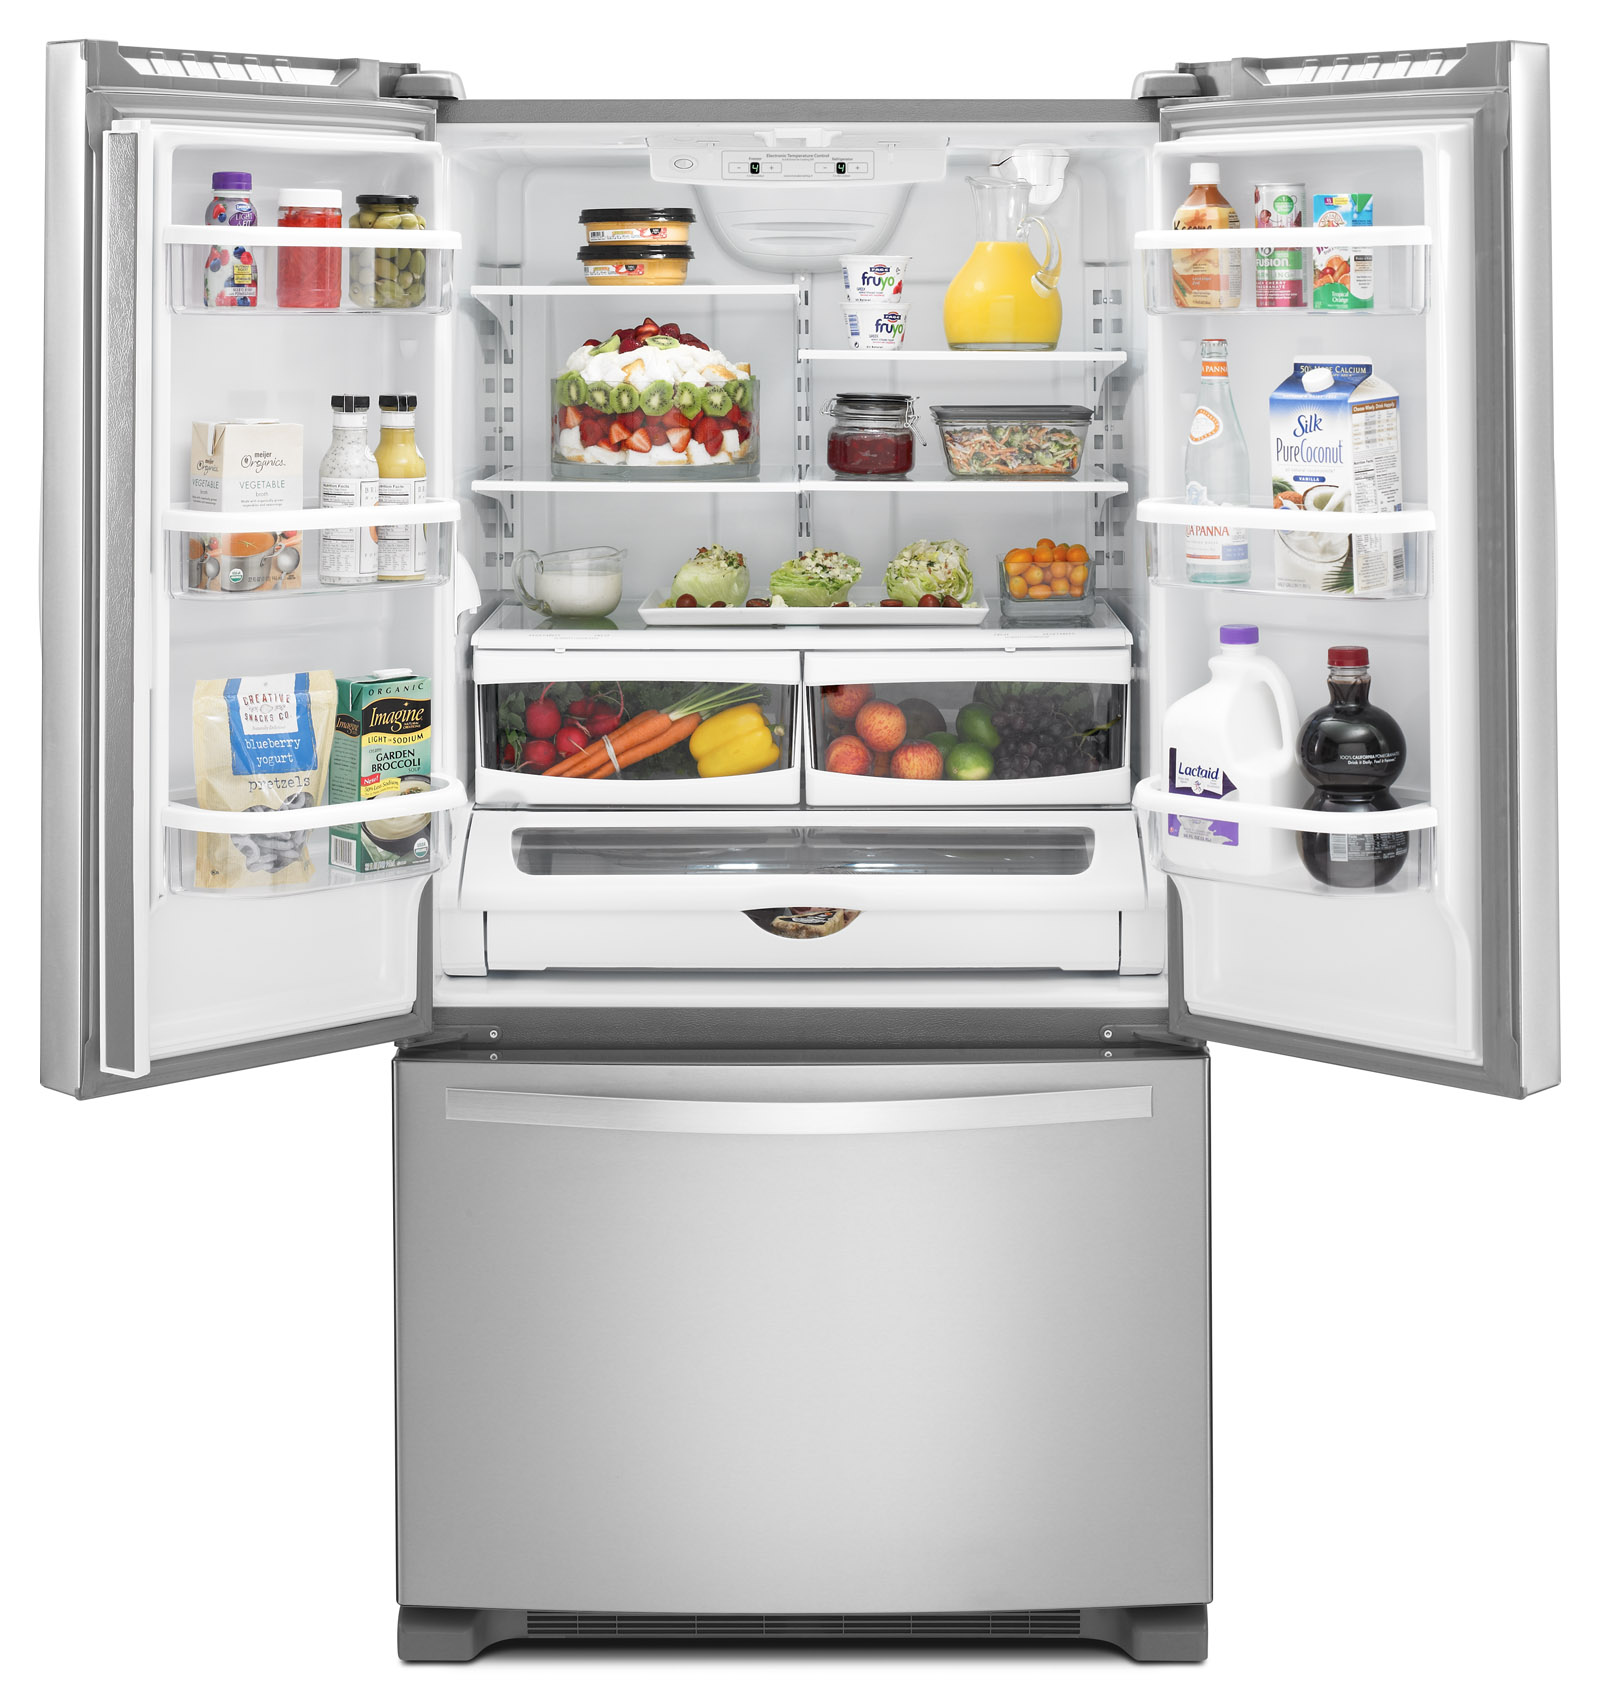 Whirlpool WRF535SWBM 25 cu. ft. French Door Refrigerator w/ Interior Water Dispenser - Stainless Steel